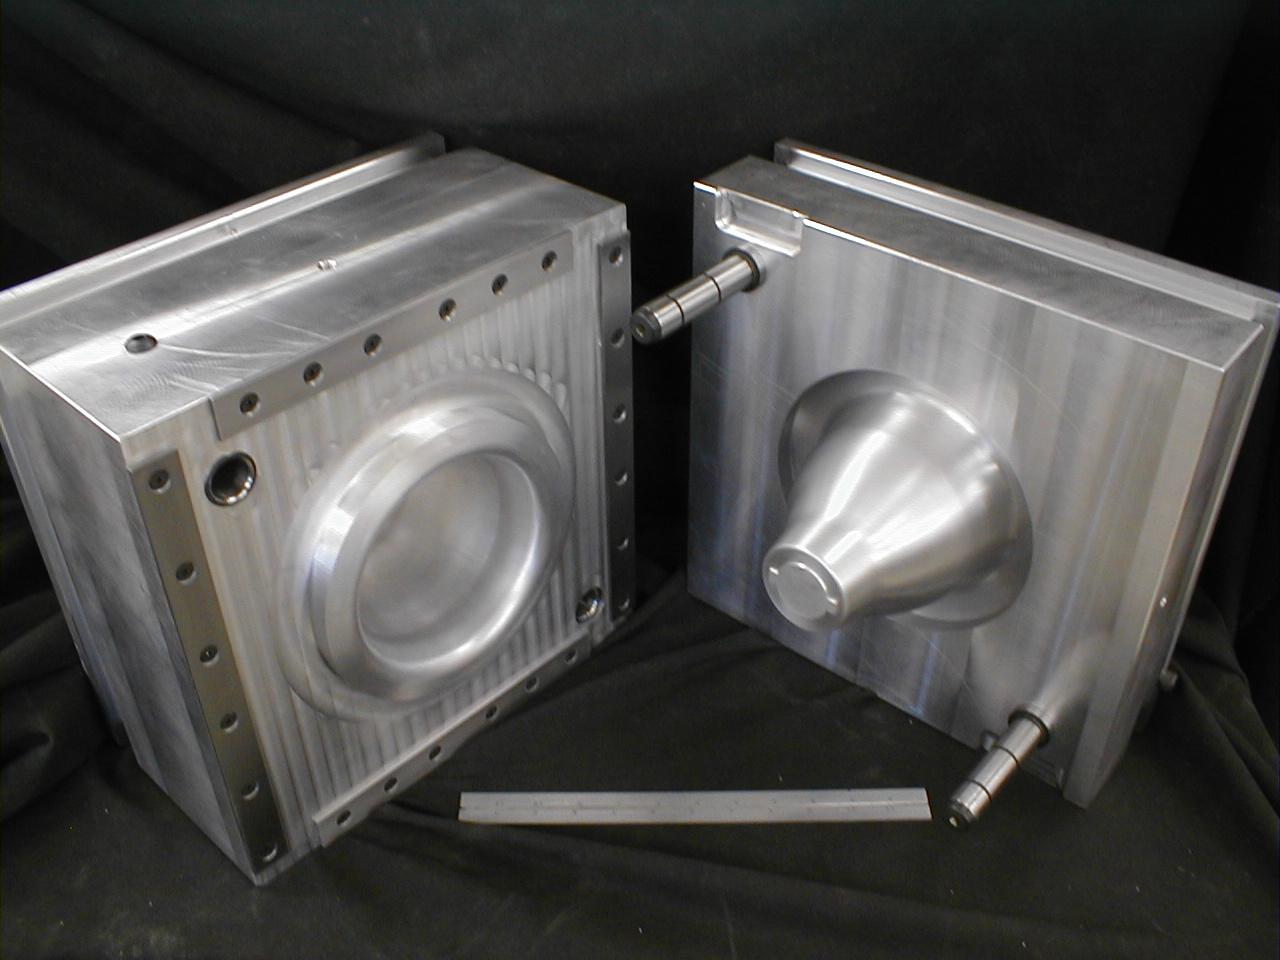 lamp_housing_aluminum_thermoset_plastic_compression_mold.jpg